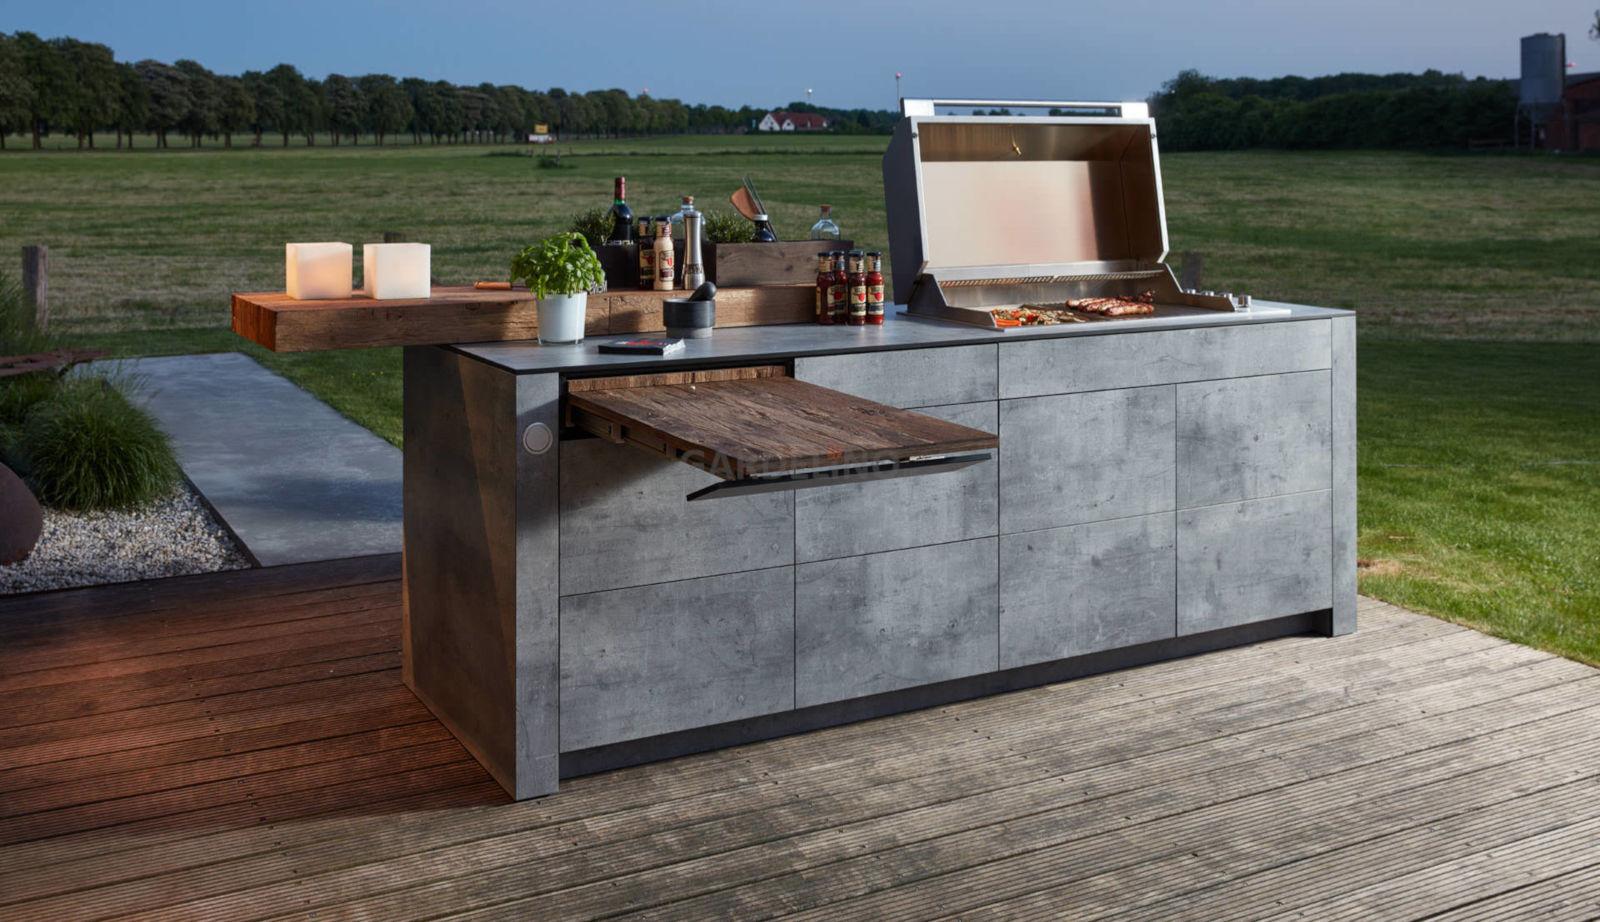 Outdoor Küche Weber : Module fÜr outdoor kÜche genesis e serie black weber neu ovp